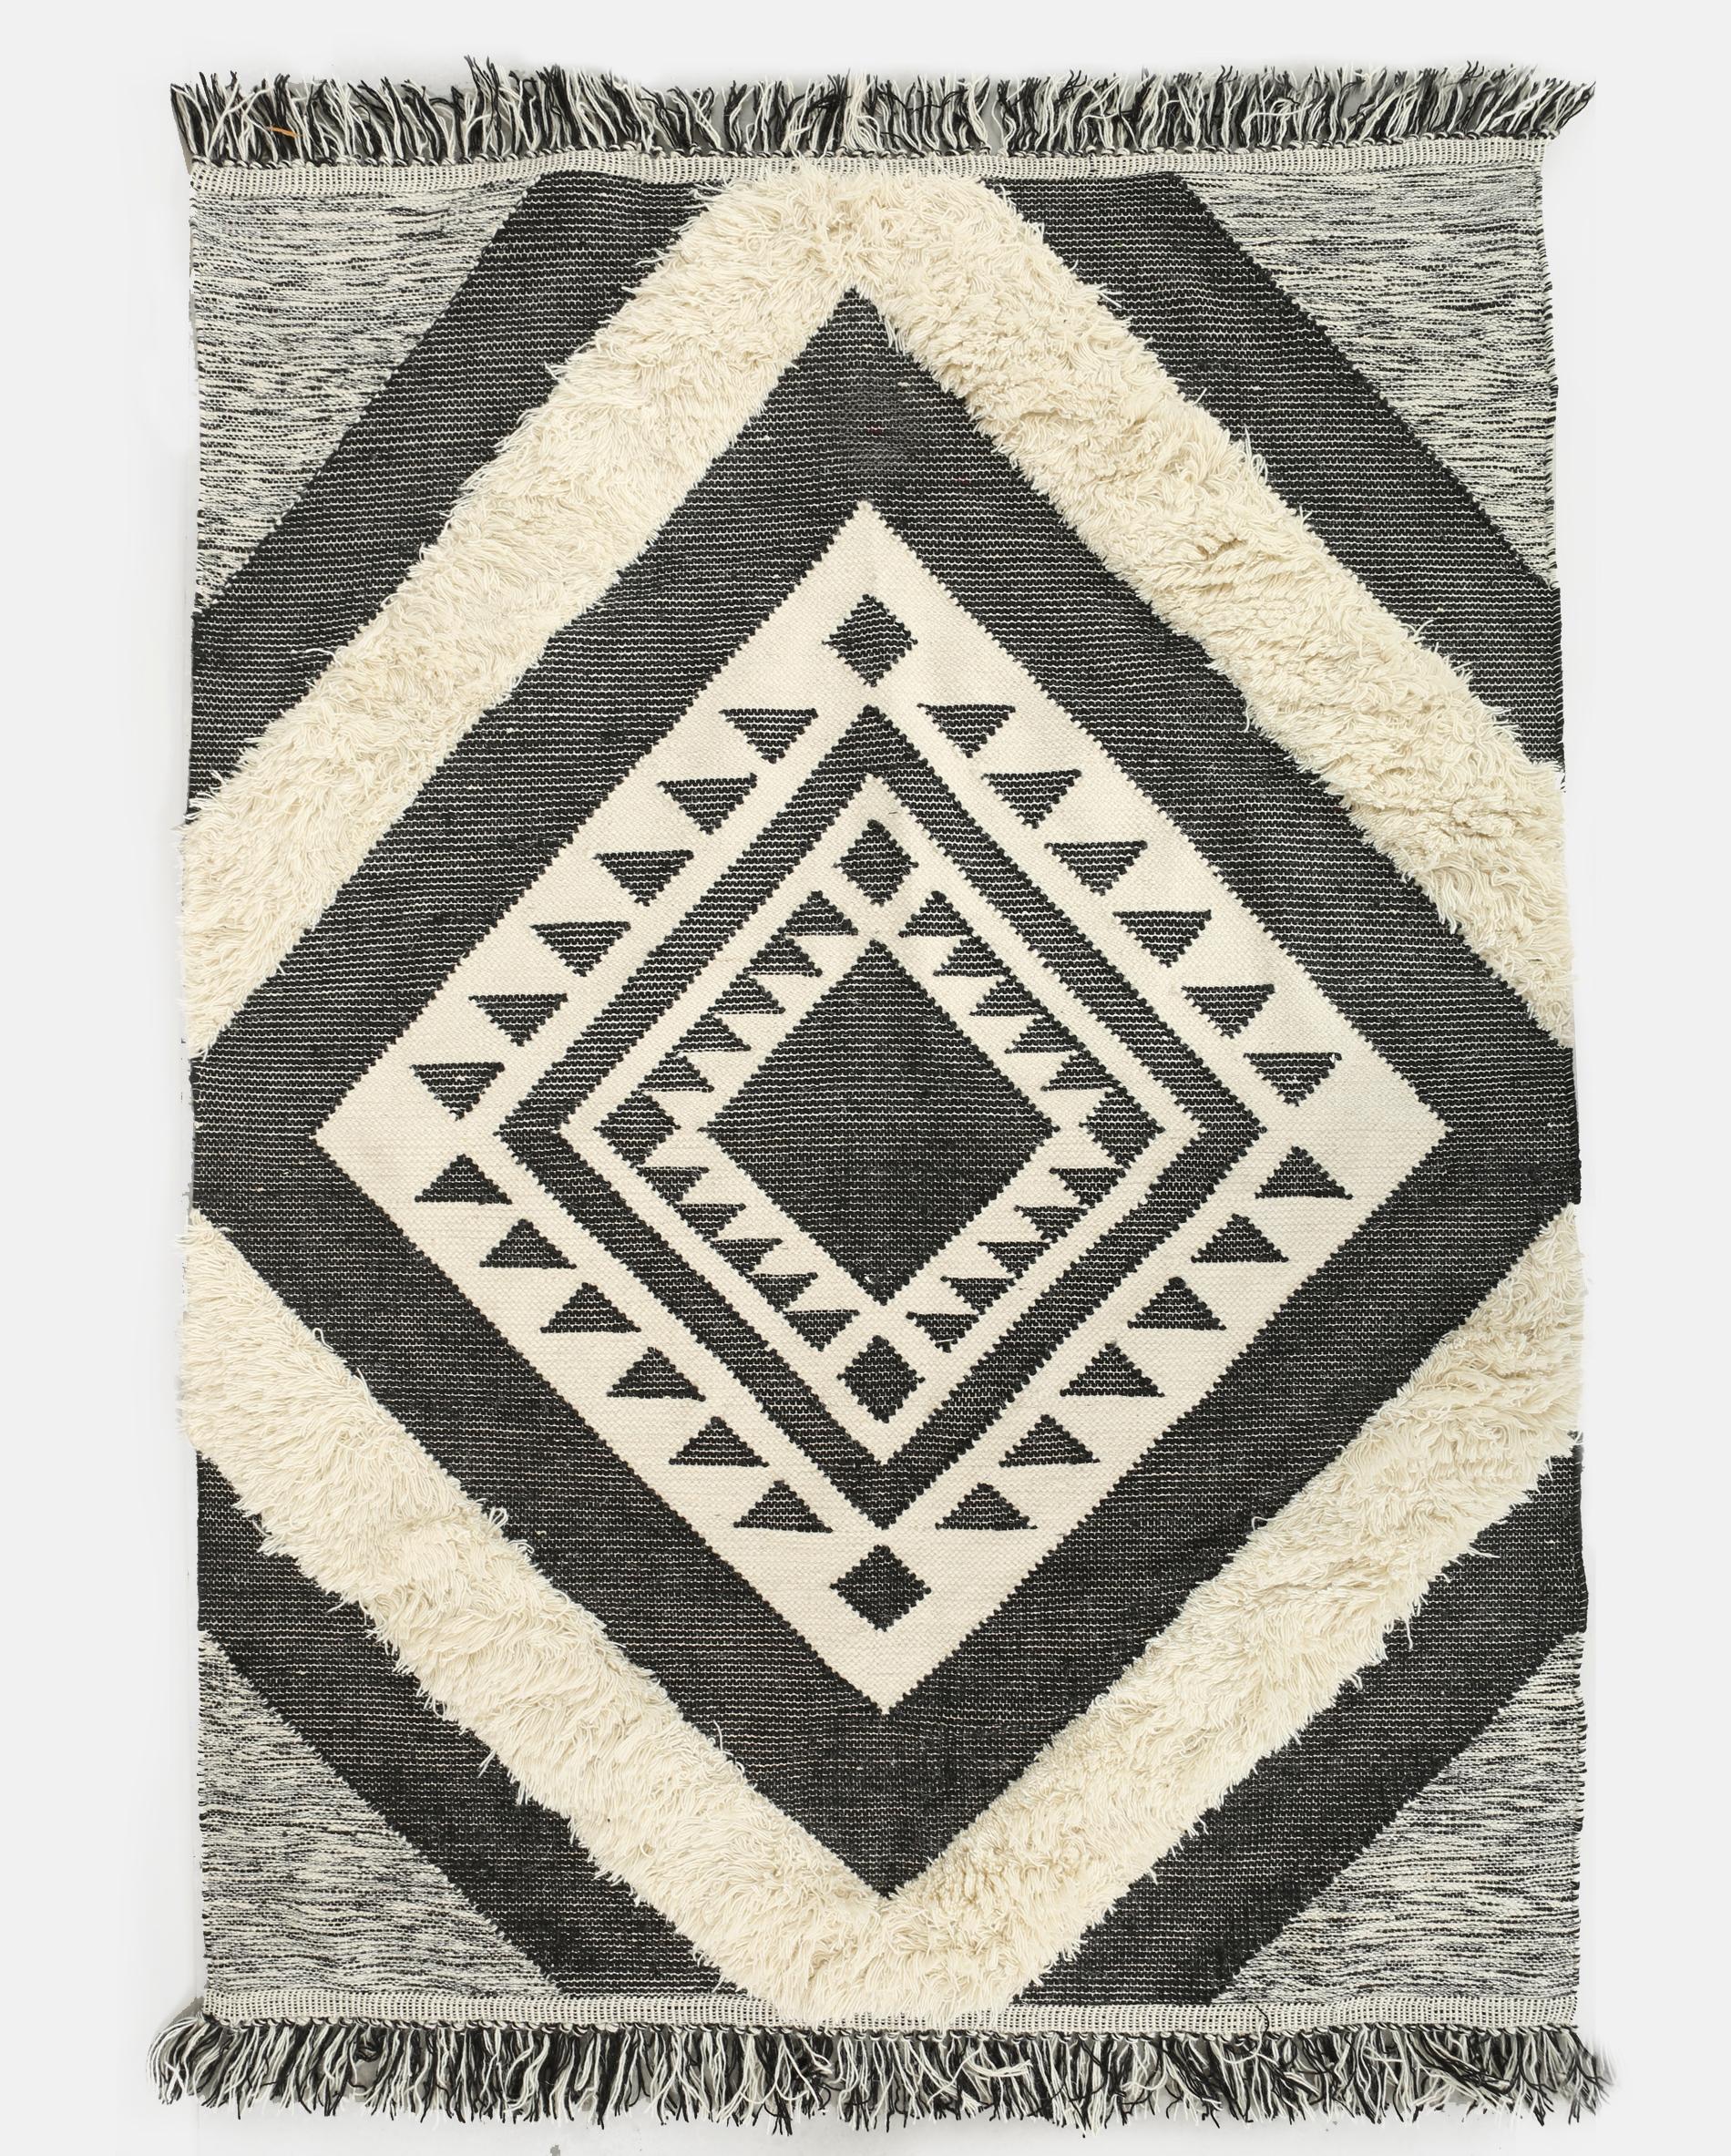 grand tapis berb re gris 904170a89f09 pimkie. Black Bedroom Furniture Sets. Home Design Ideas